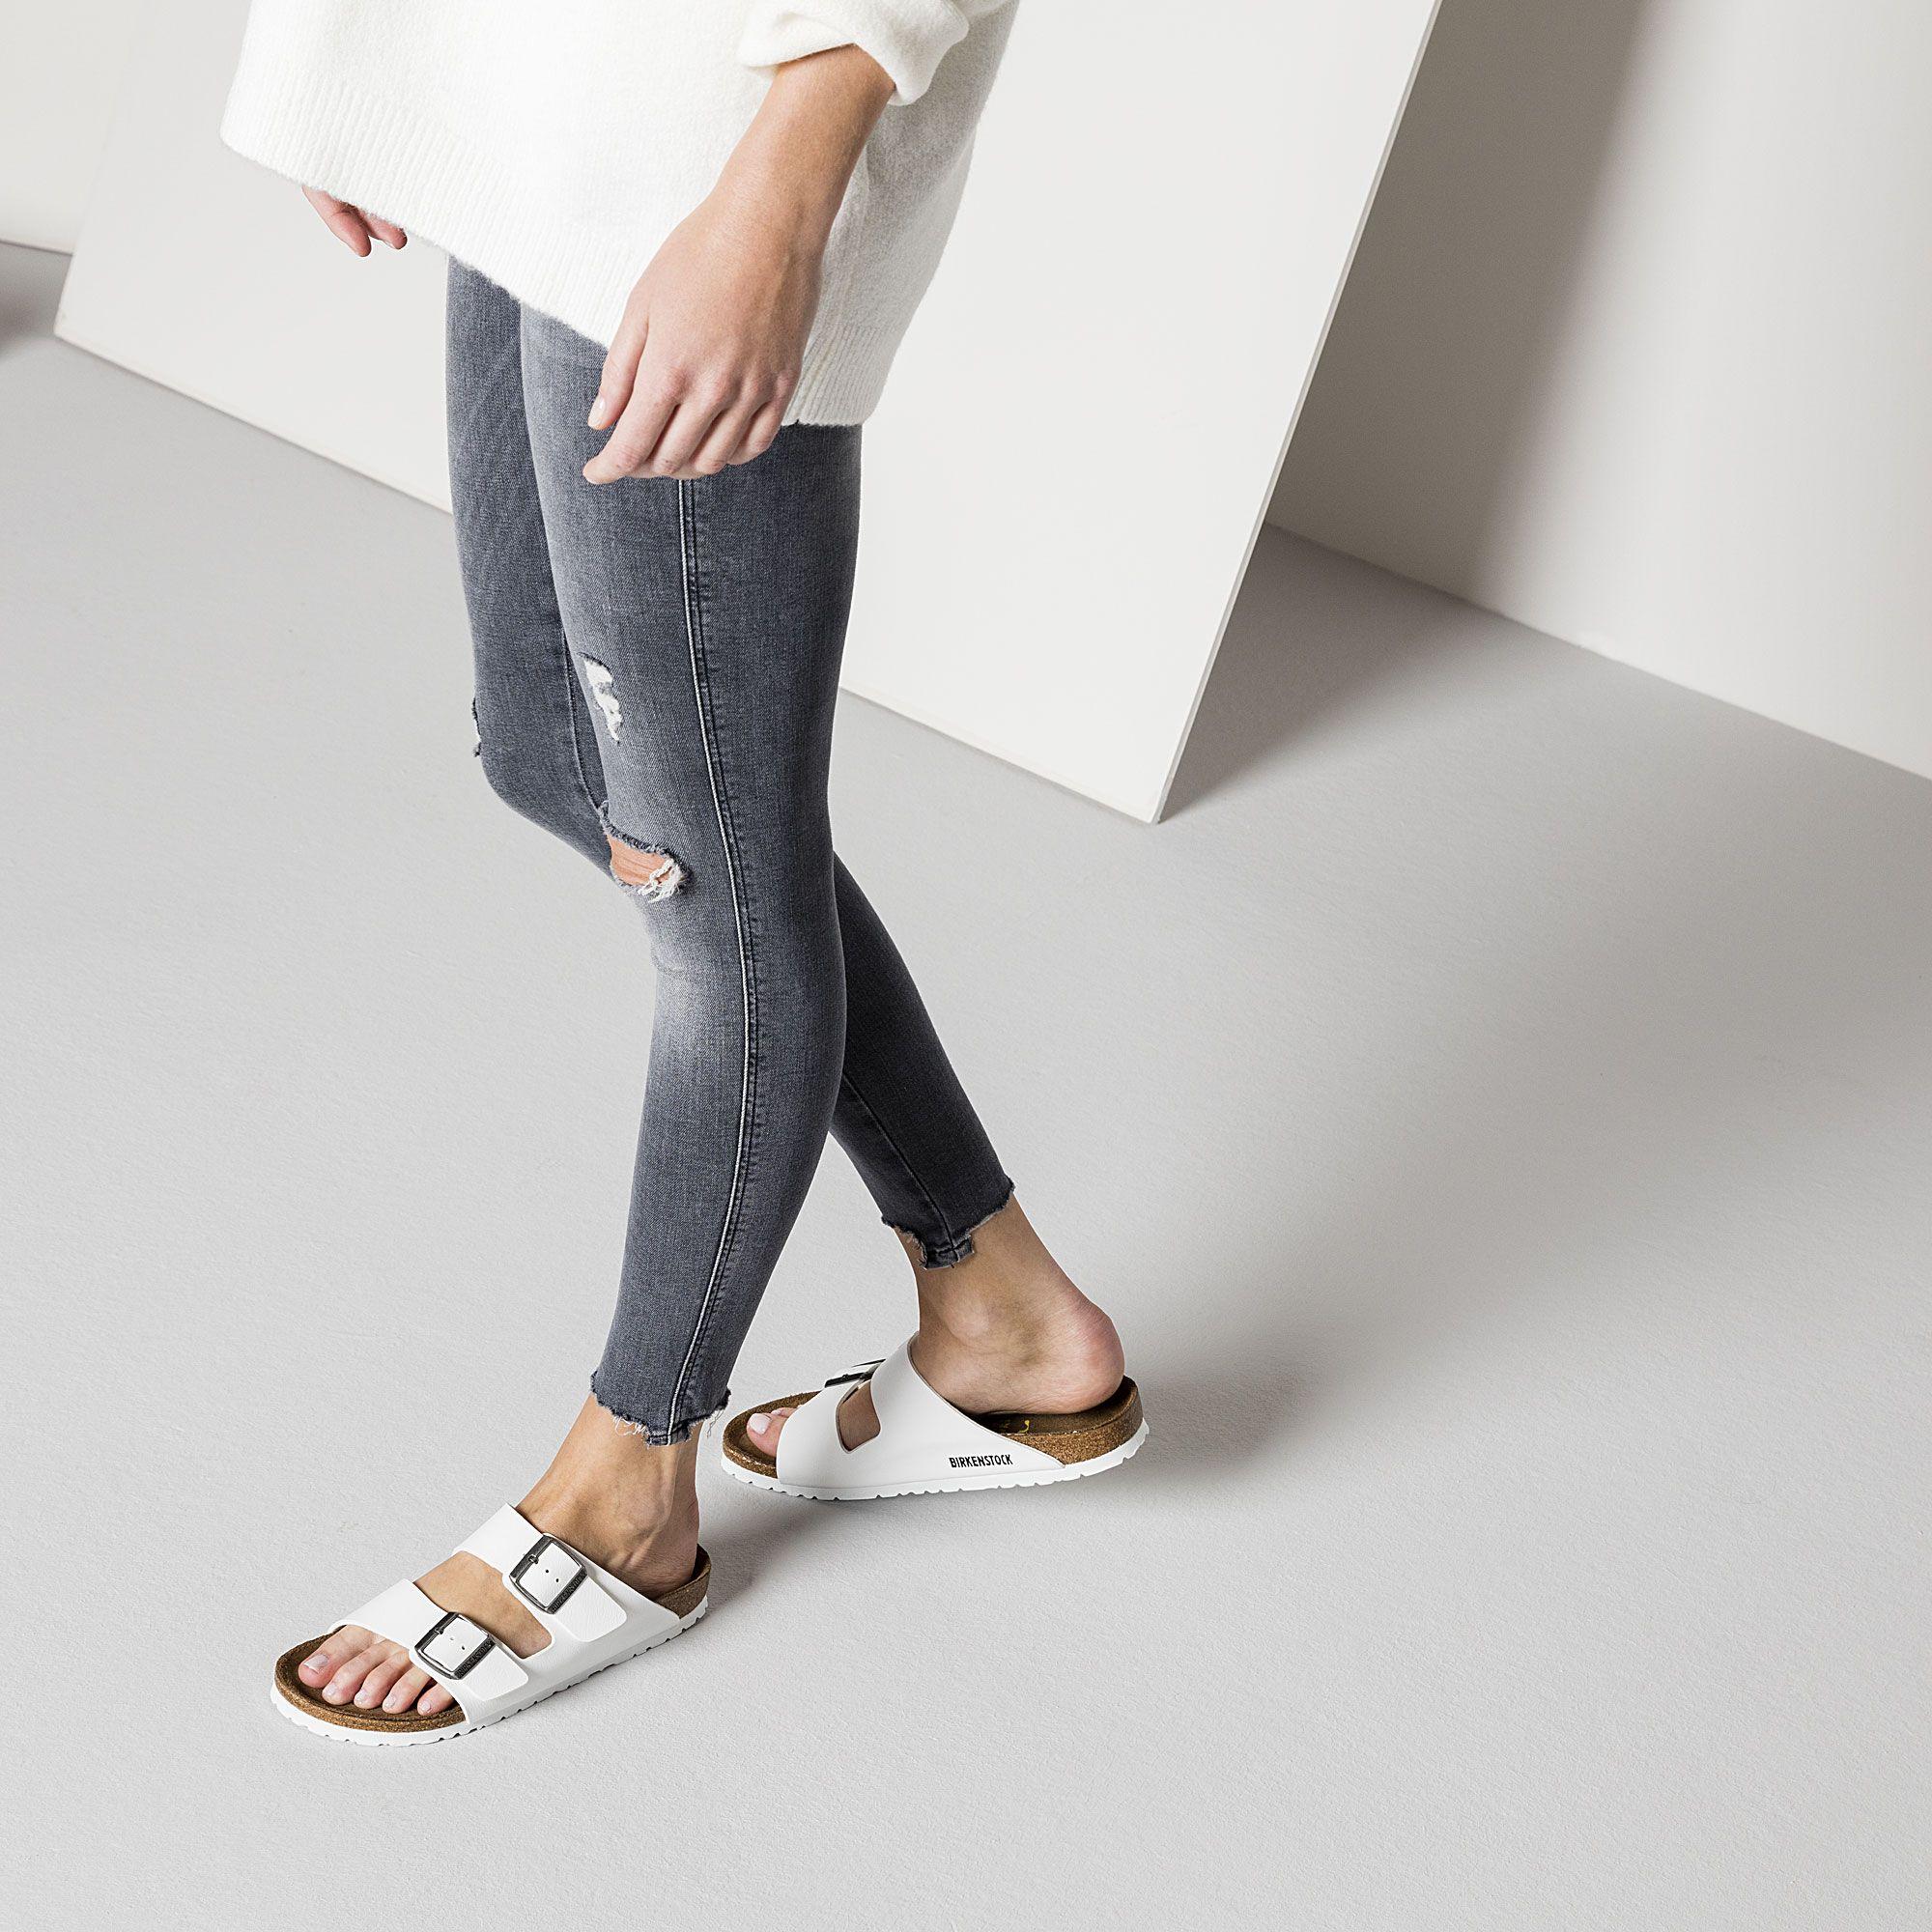 7357d8bb4f6b0d Arizona Birko-Flor White (White Sole) Birkenstock Style